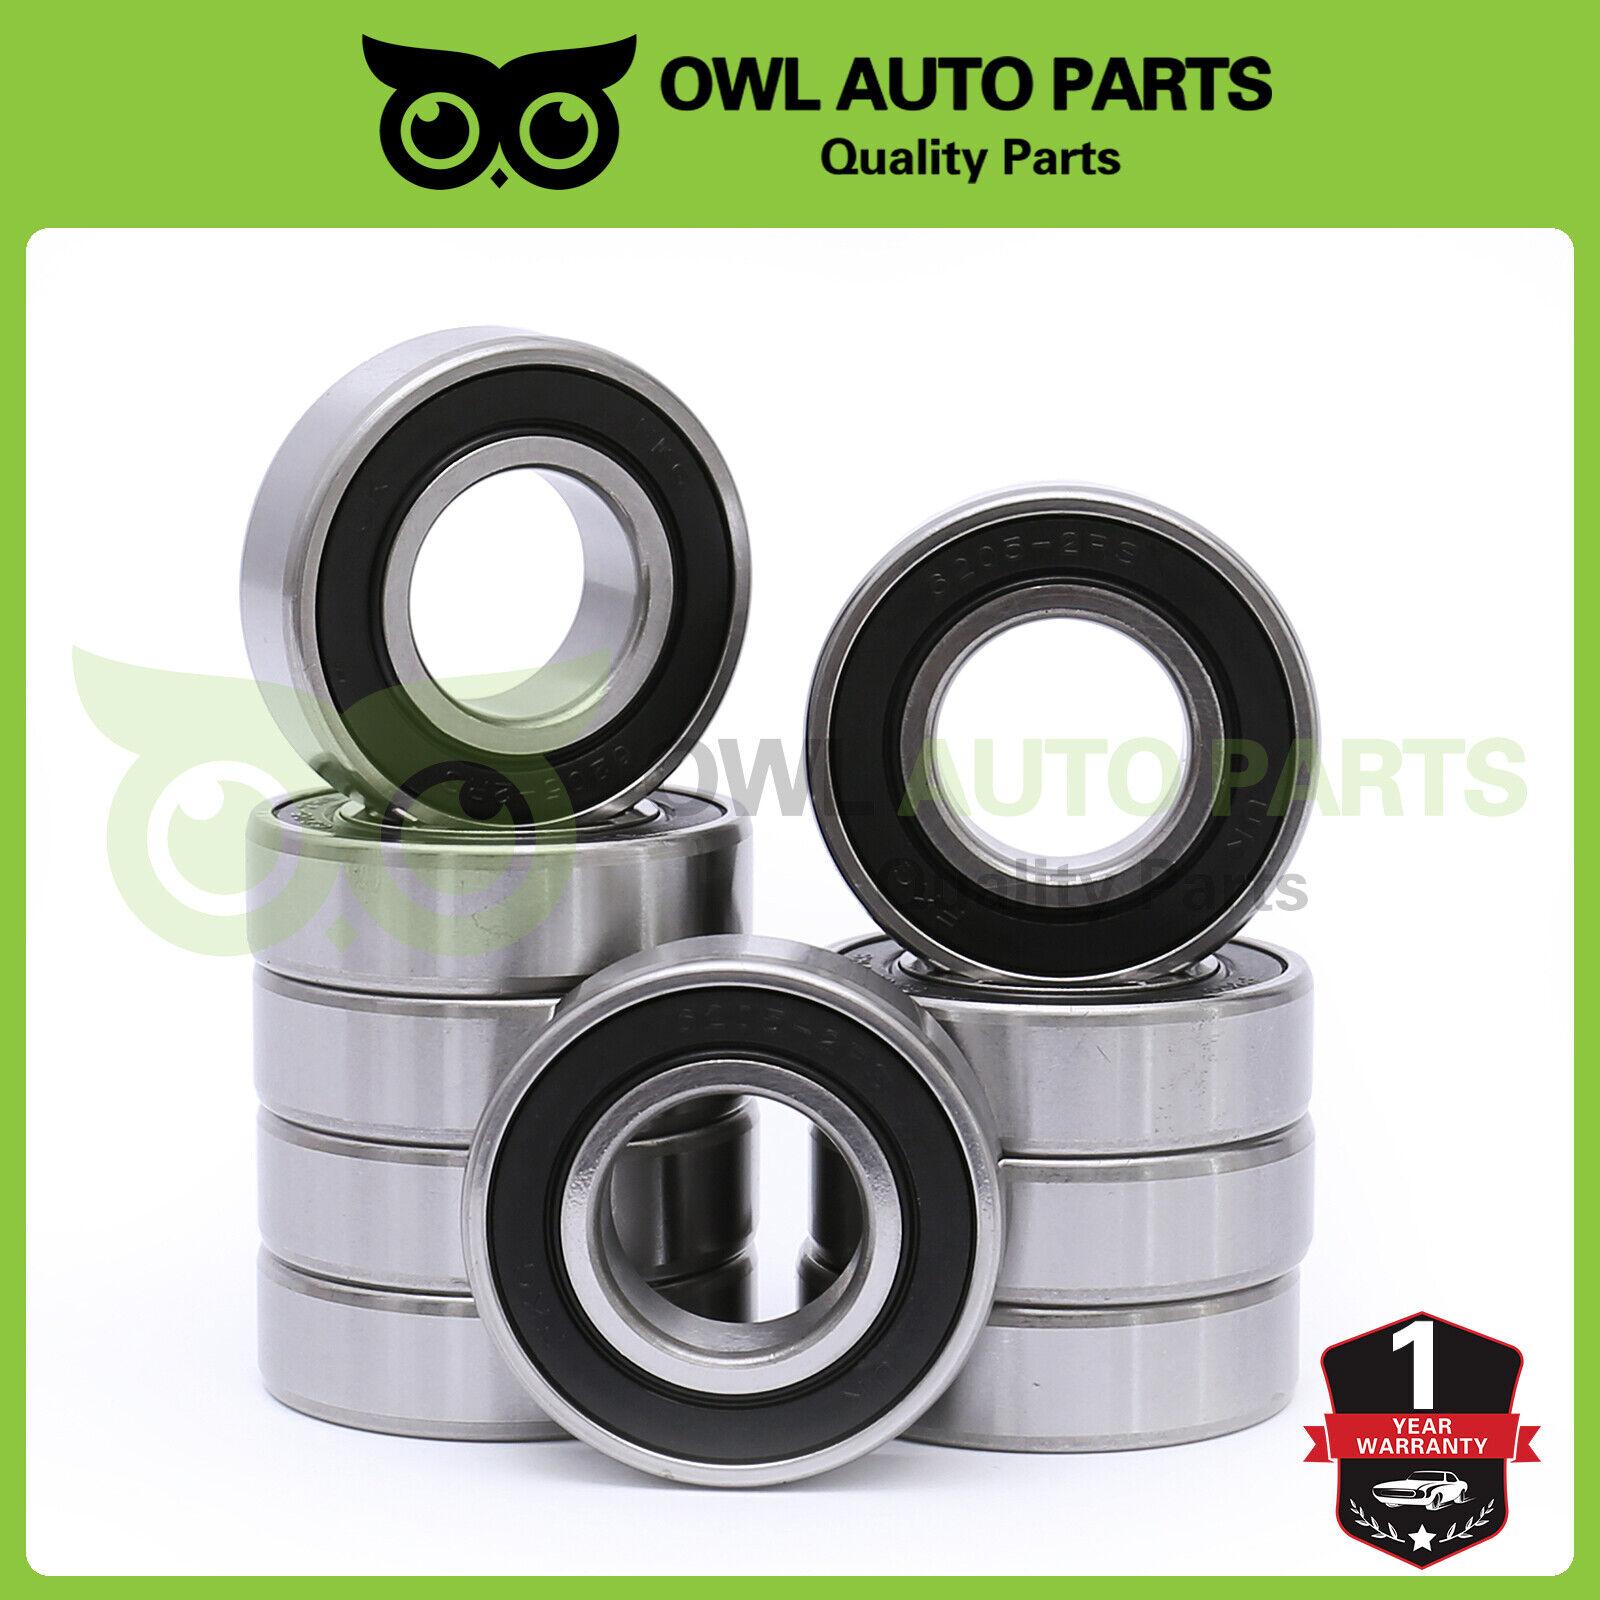 6304-2RS quality seal bearing 6304 rs  ball bearings 6304-rs 20x52x15 Qty. 2